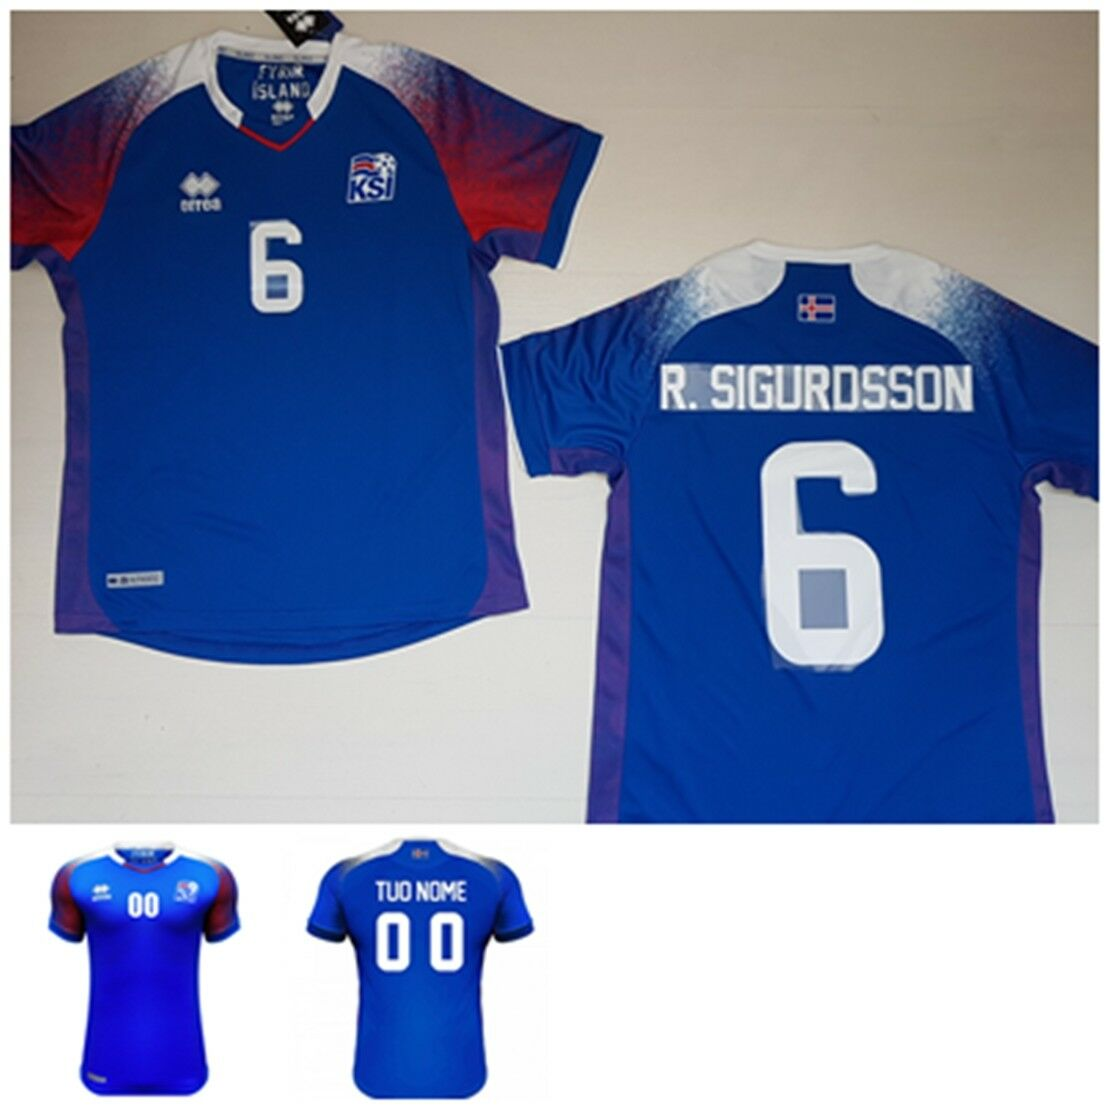 2018 ERREA ISLANDA ICELAND Ísland MAGLIA R.SIGURDSSON JERSEY T-SKYRTA RUSSIA  25